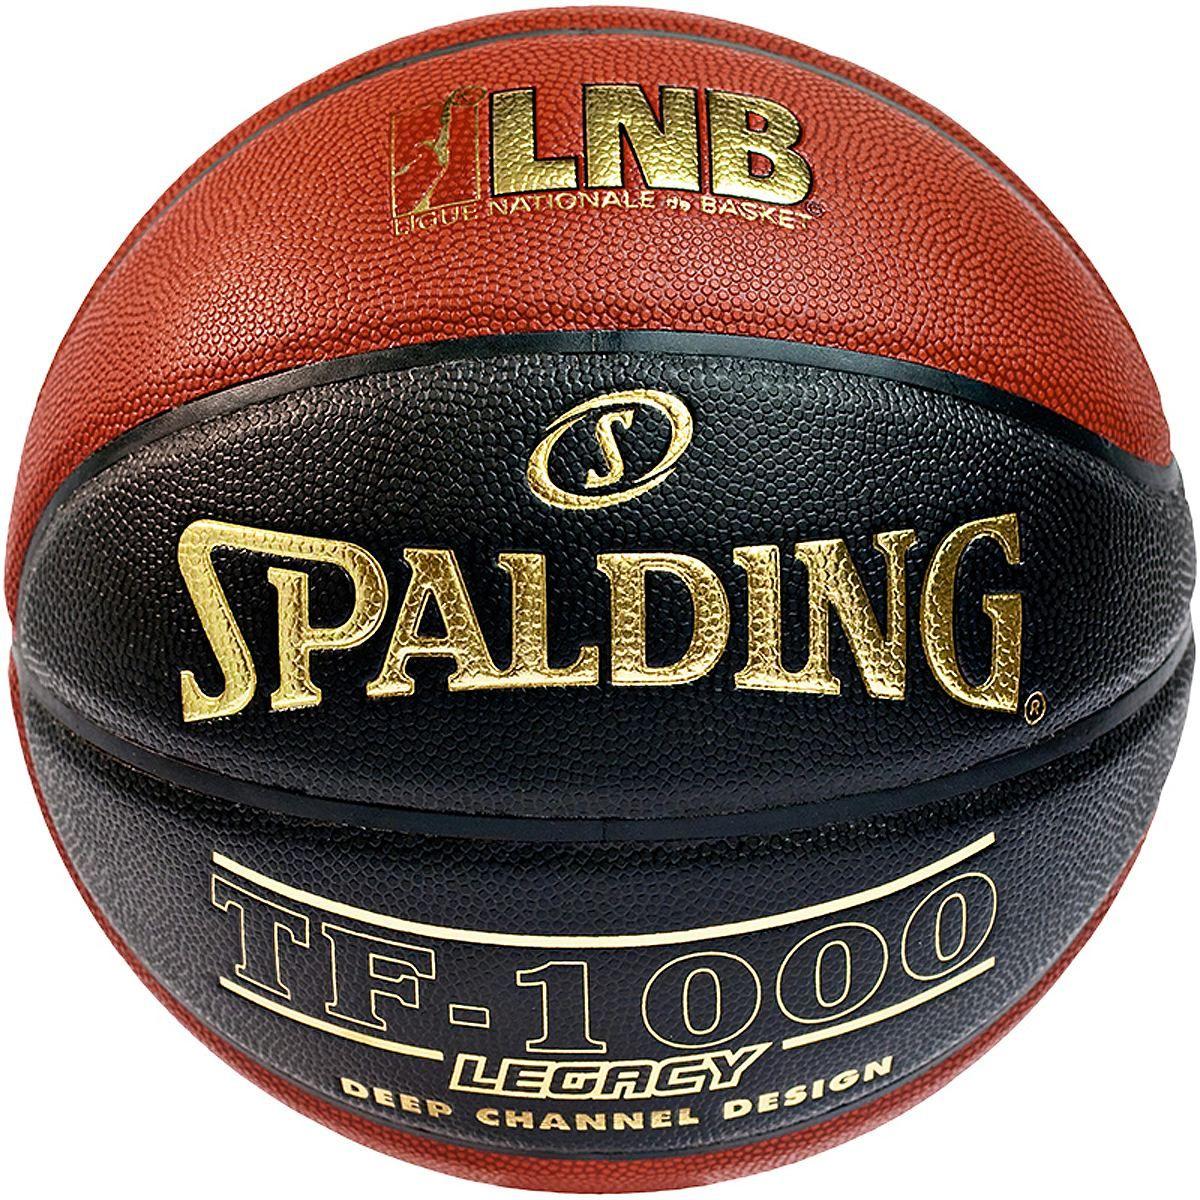 Lnb Basketball